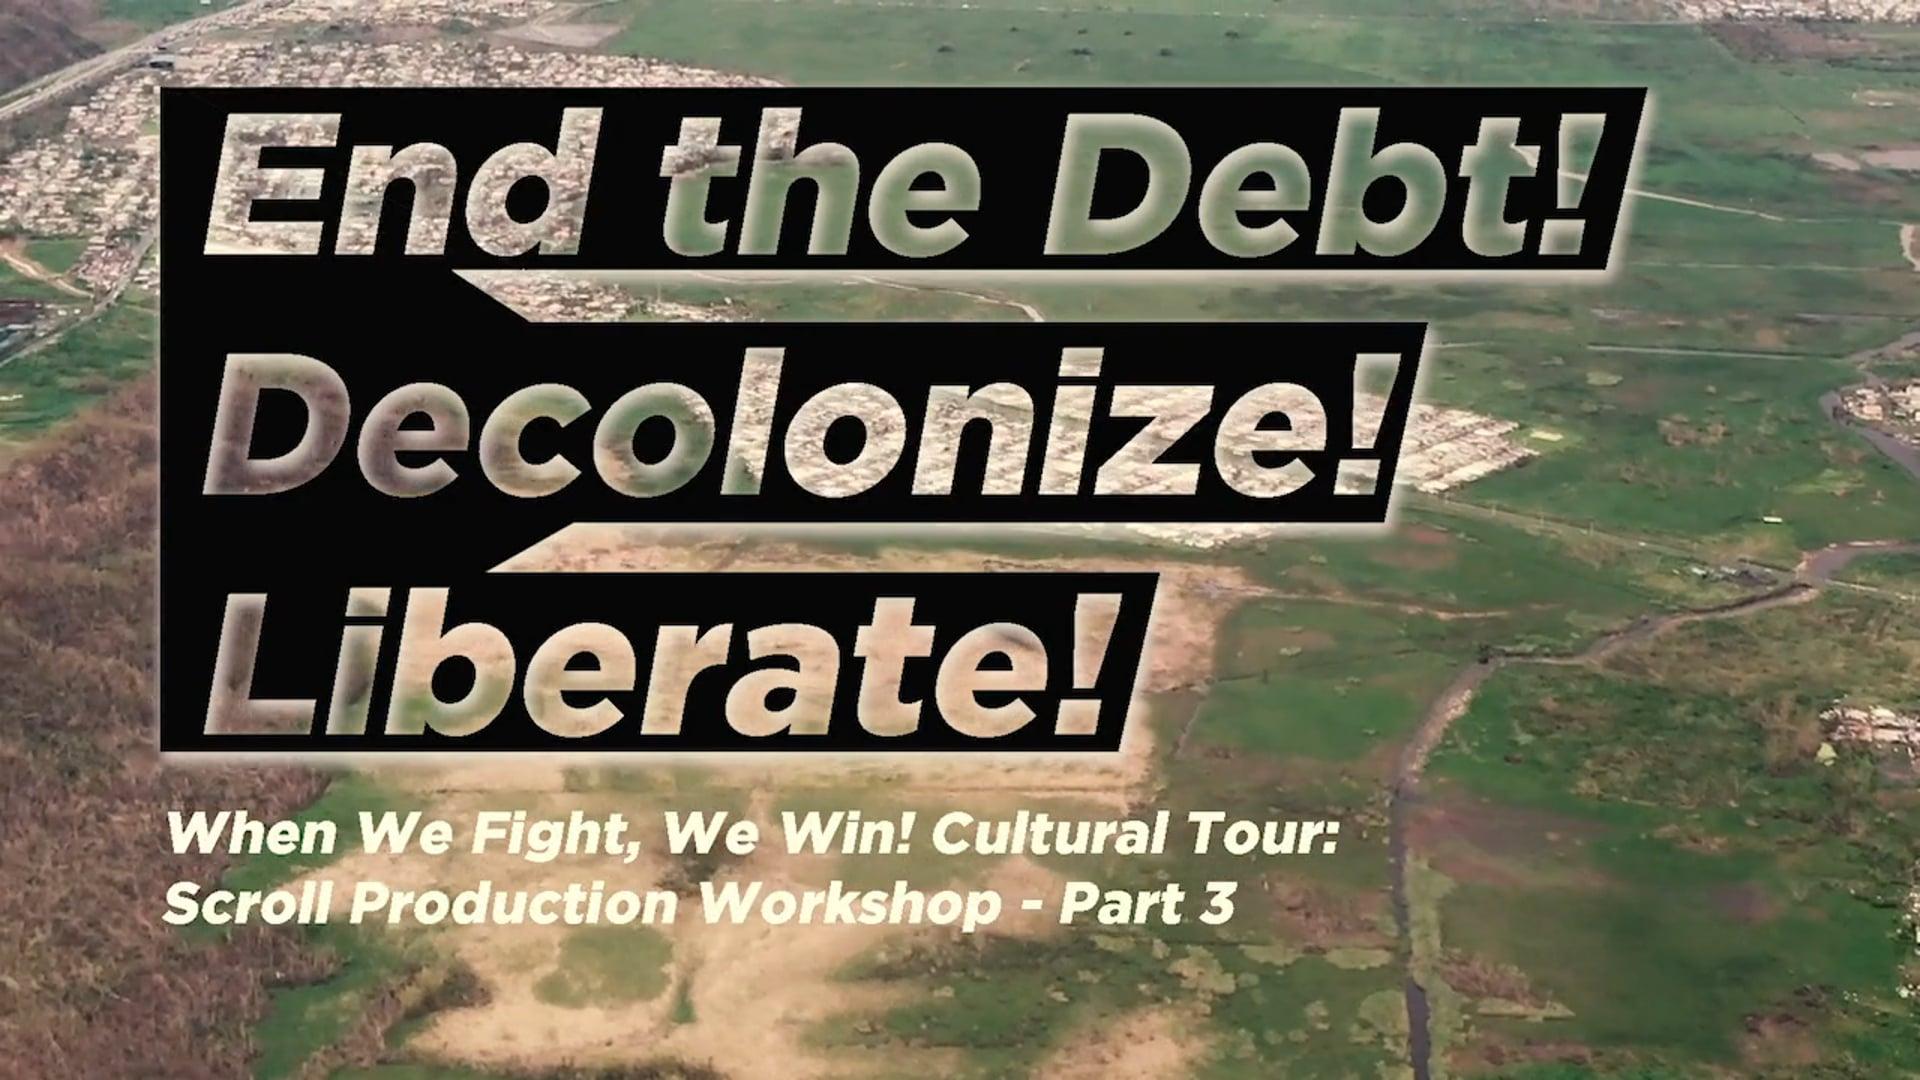 END THE DEBT! DECOLONIZE! LIBERATE! Scroll Production Workshop - PART 3